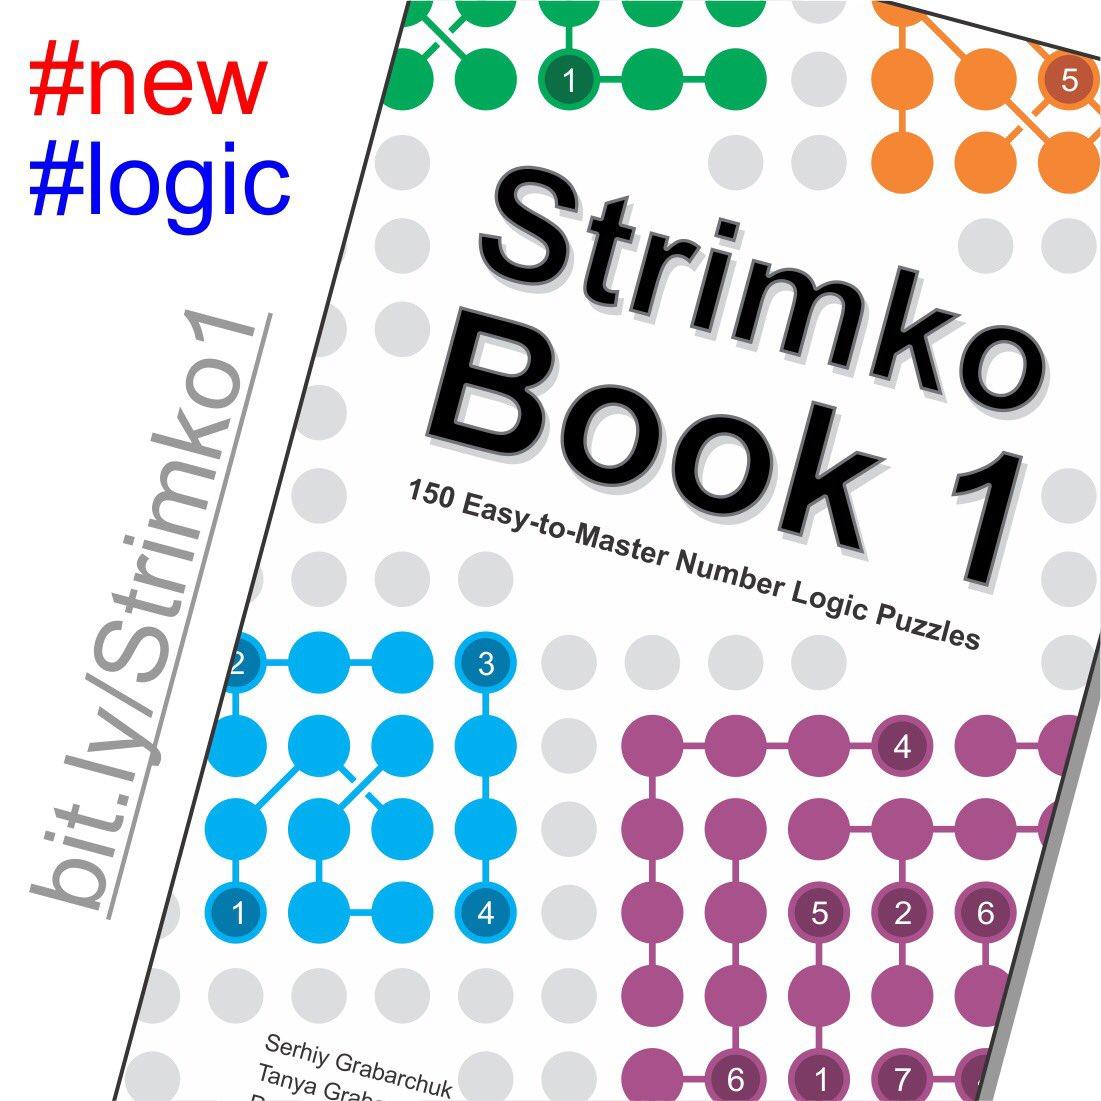 Strimko Logic Puzzle on Twitter: